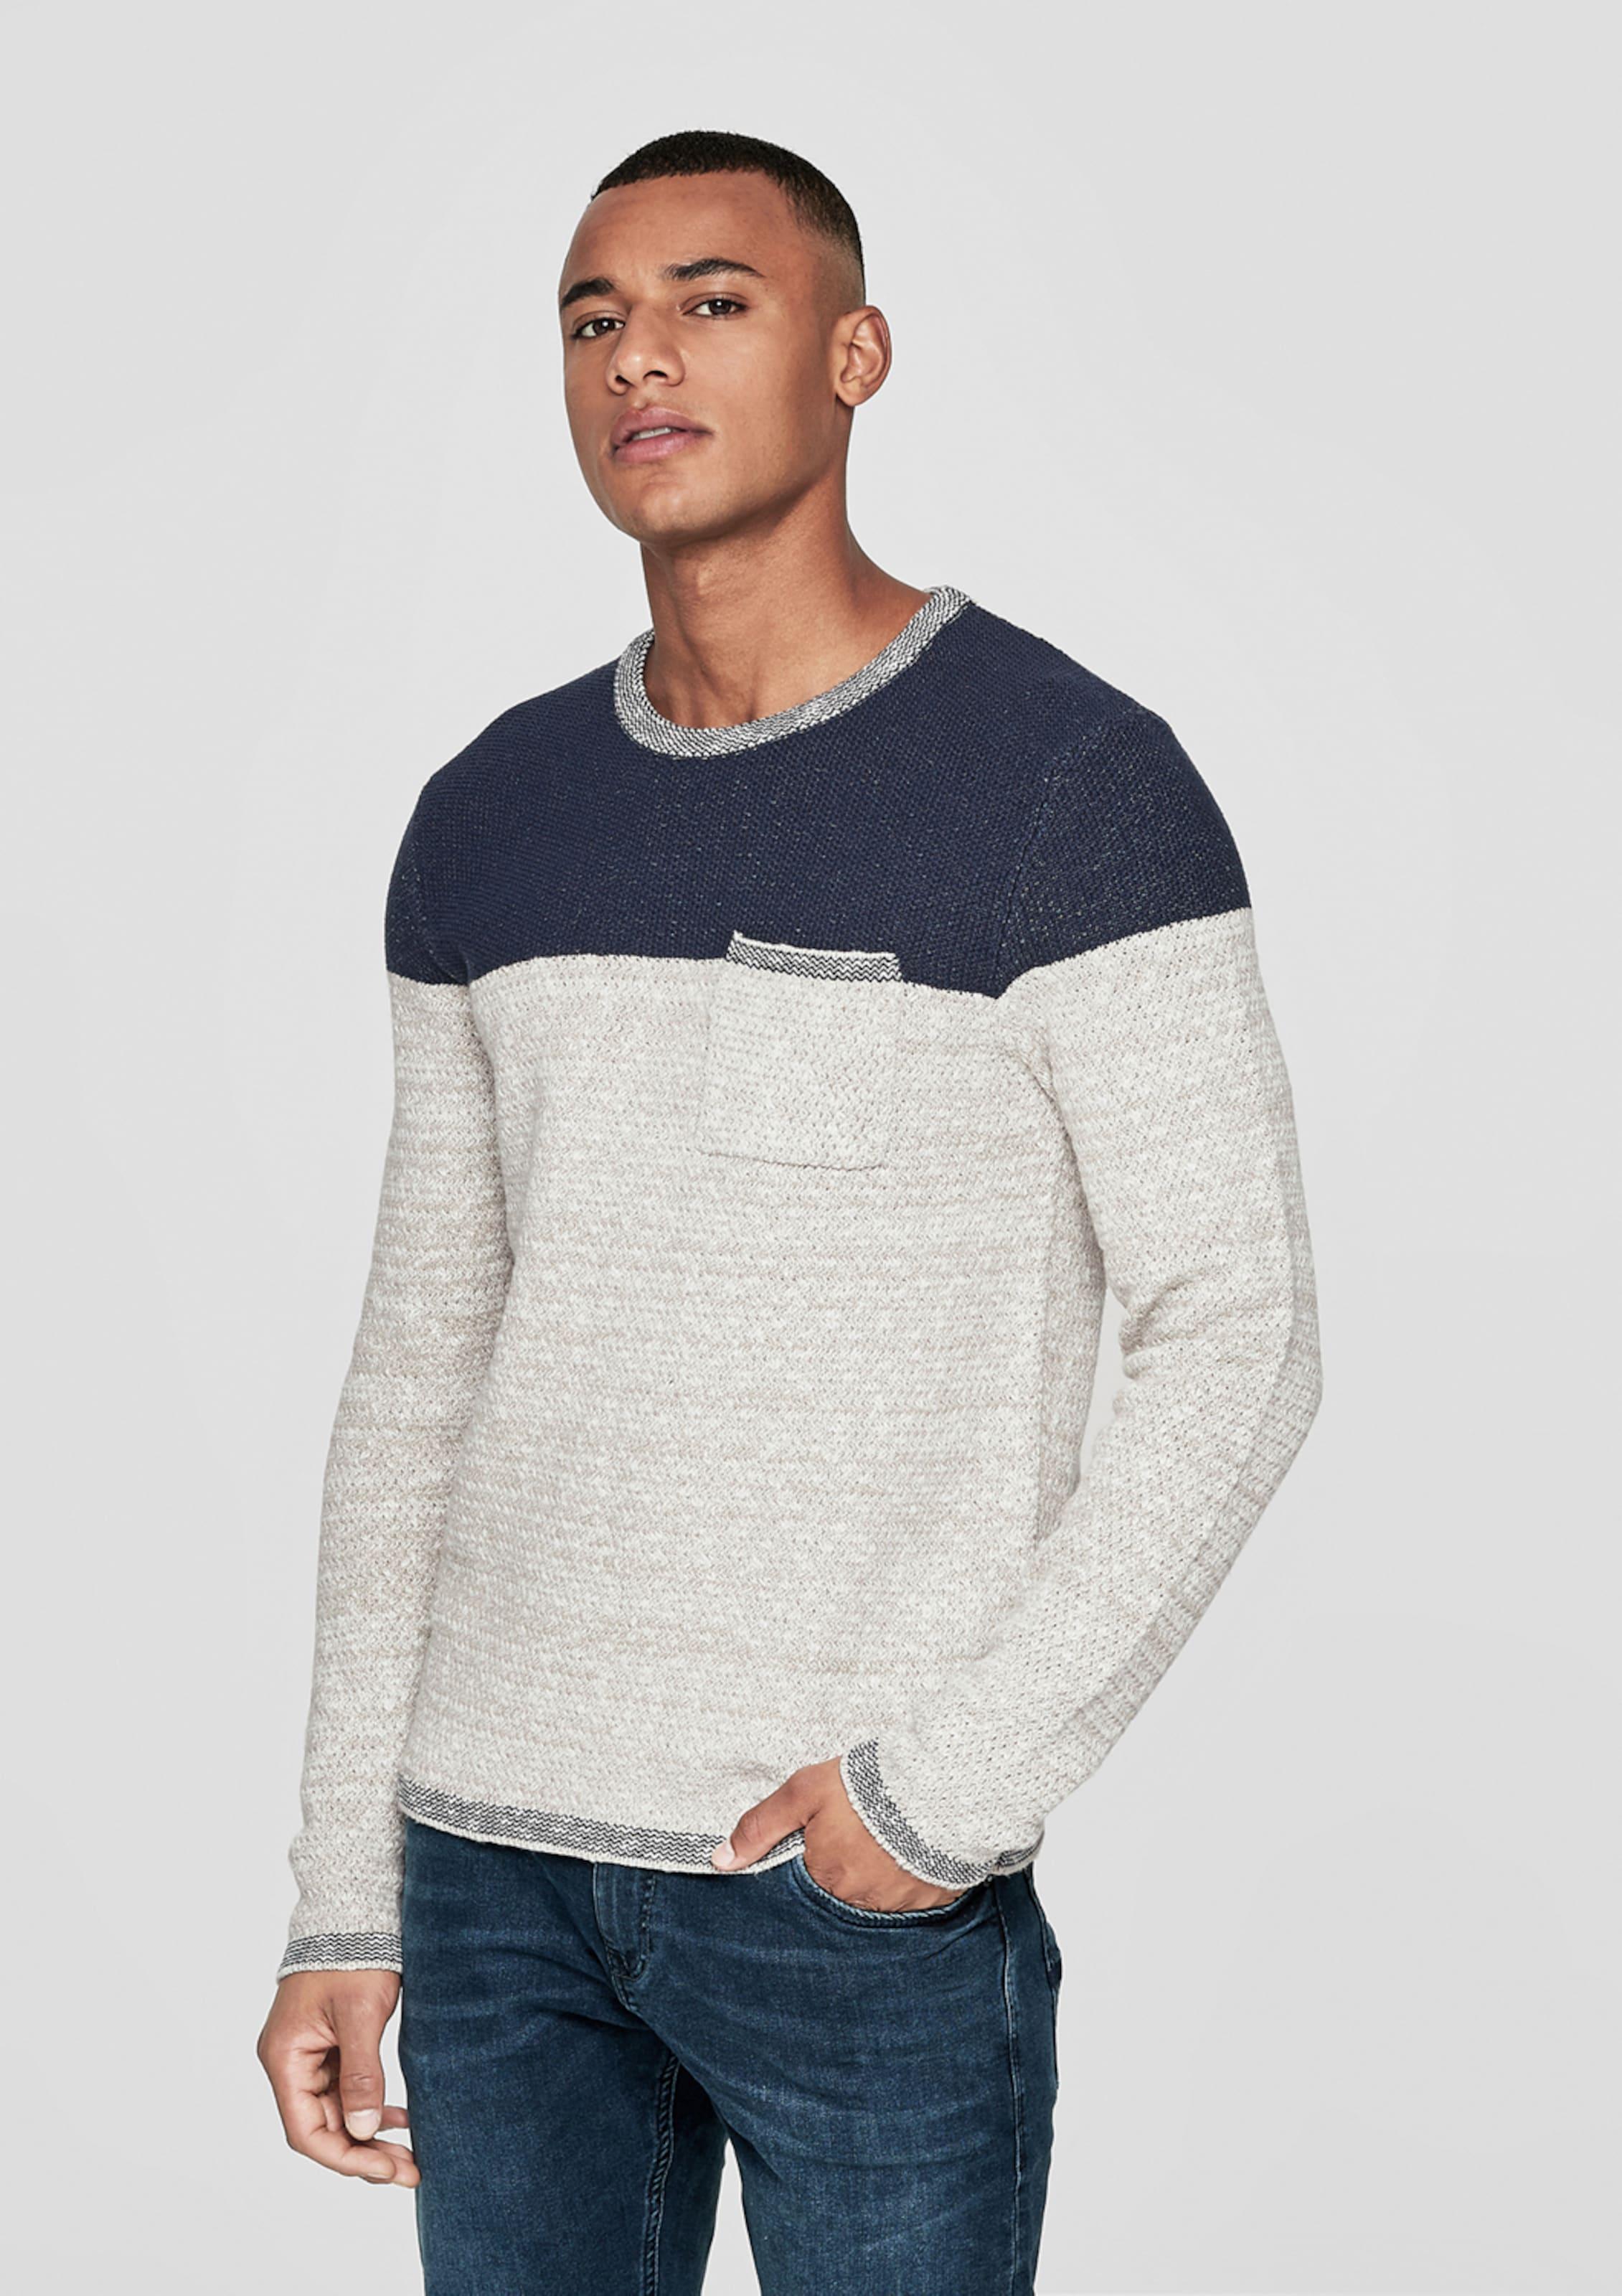 In Designed BeigeBlau Pullover By Q s kwPXZiuOT